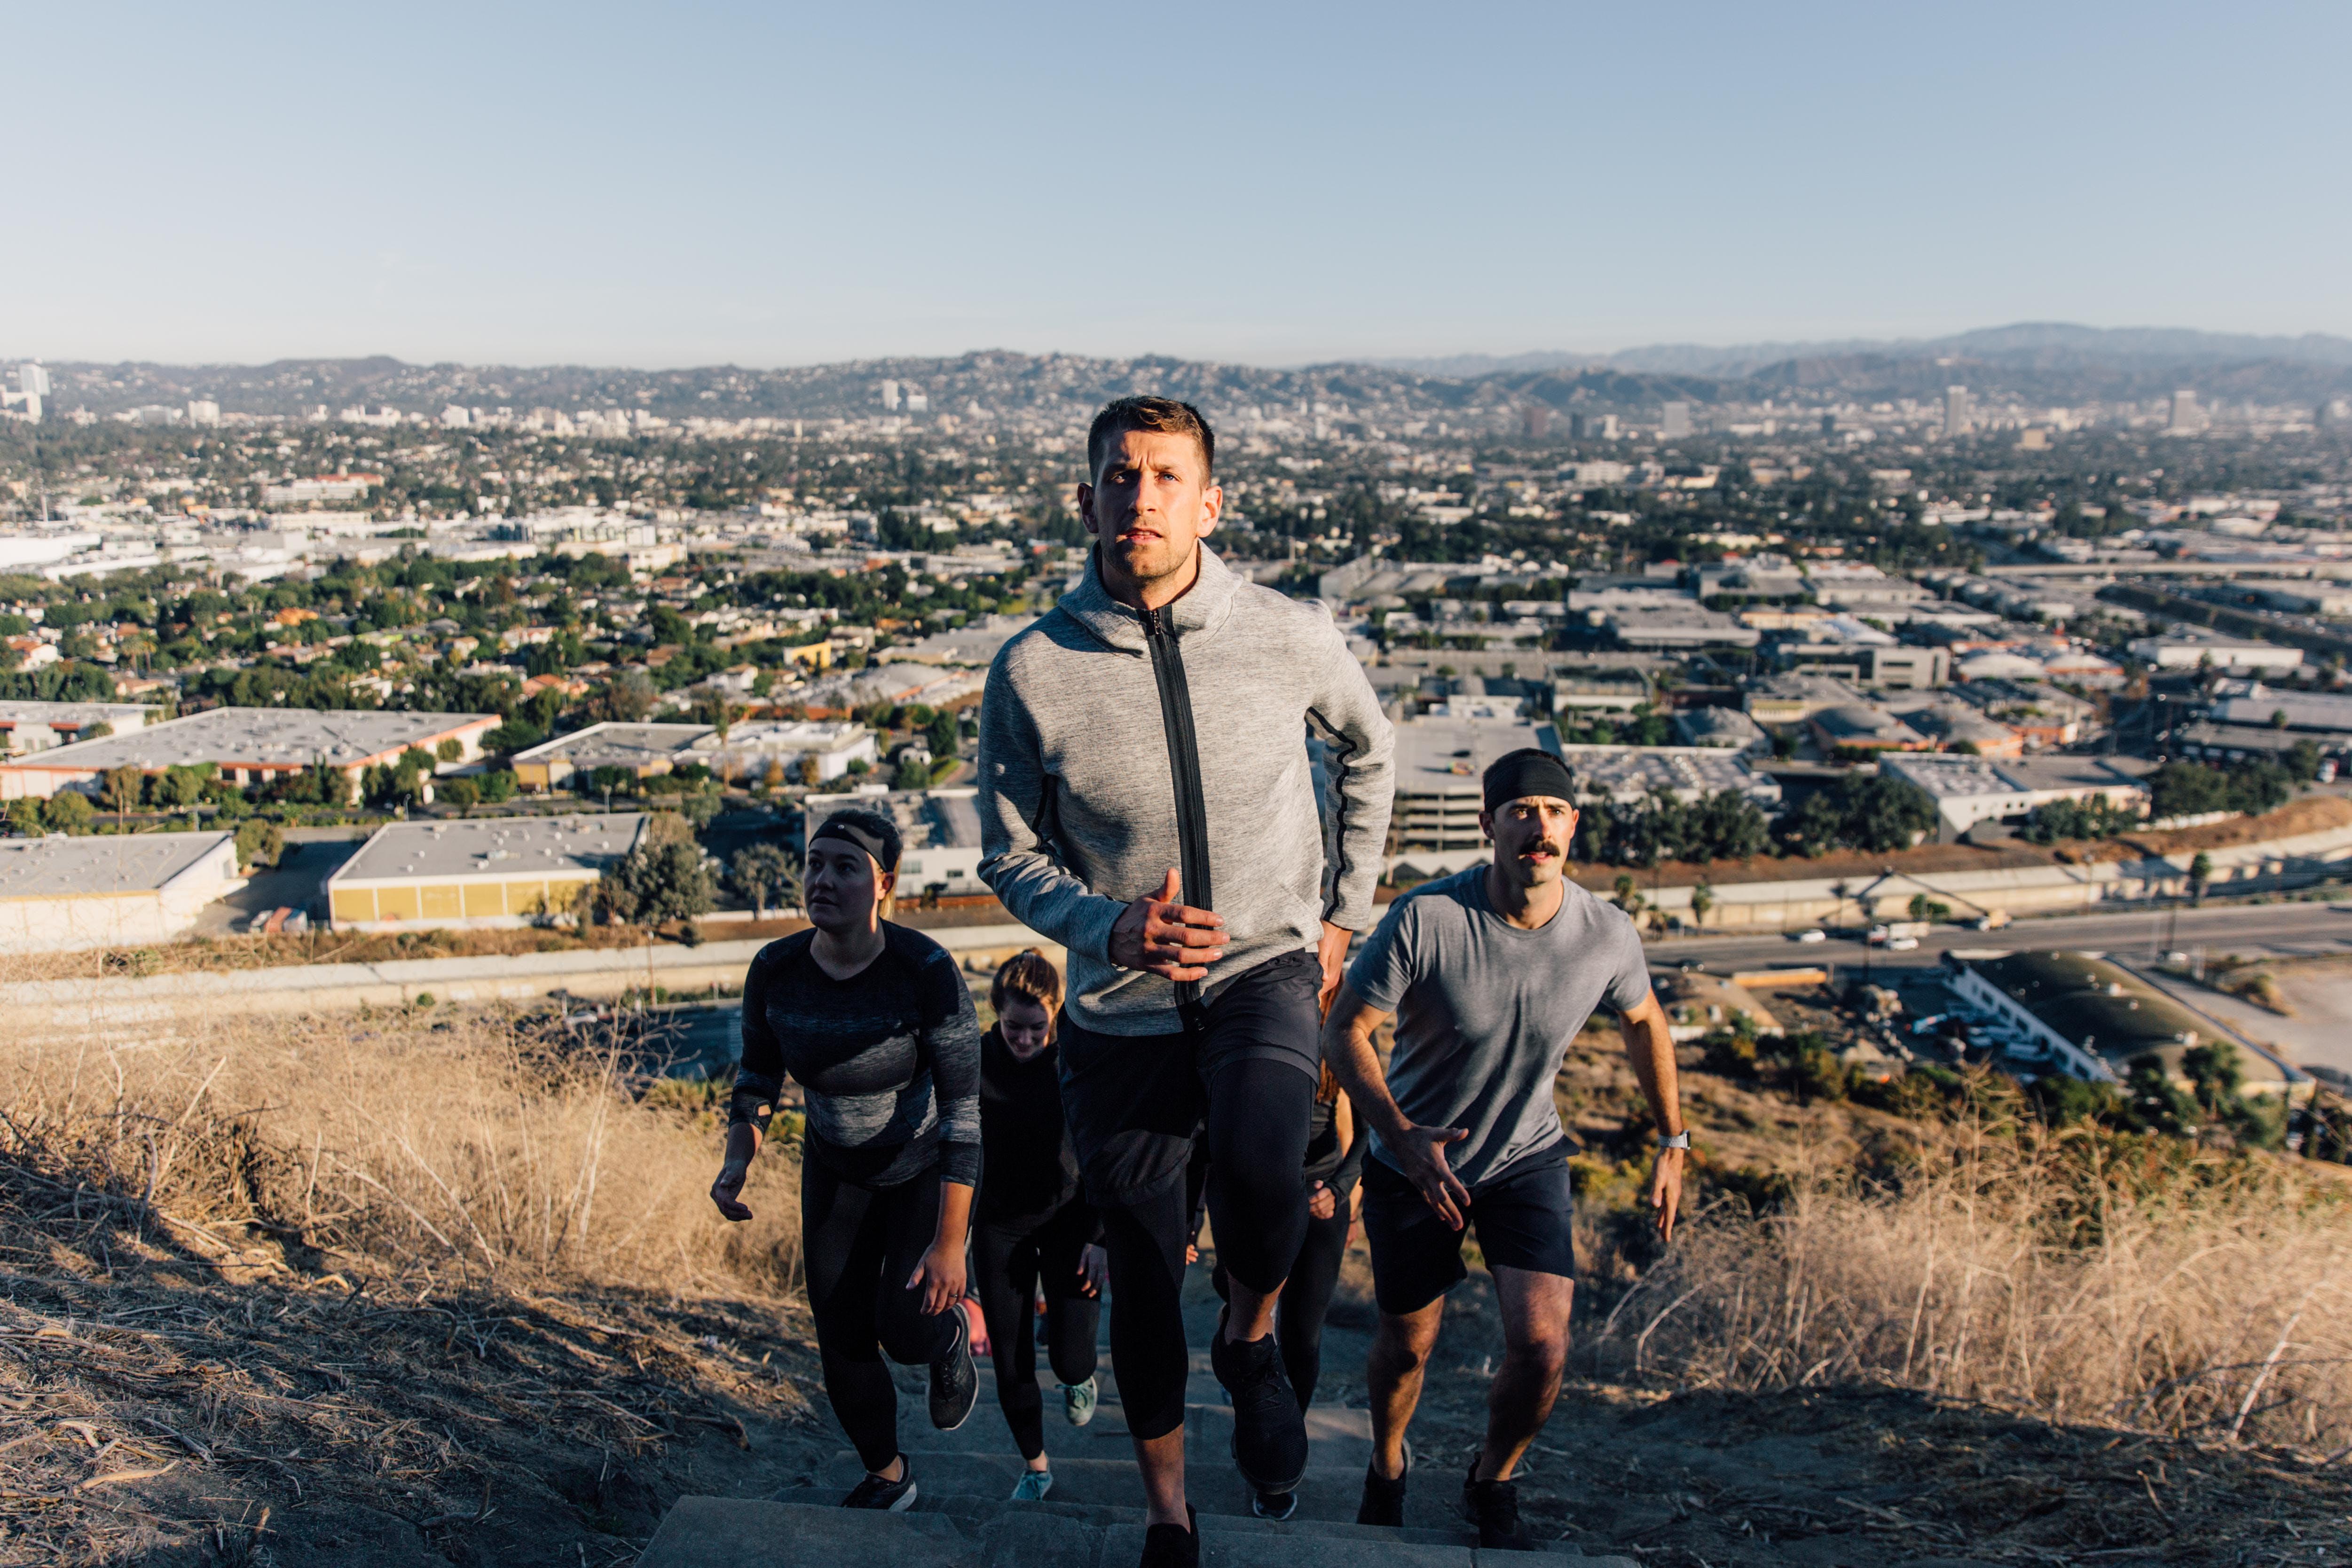 753 Los Angeles Health Amp Wellness Events